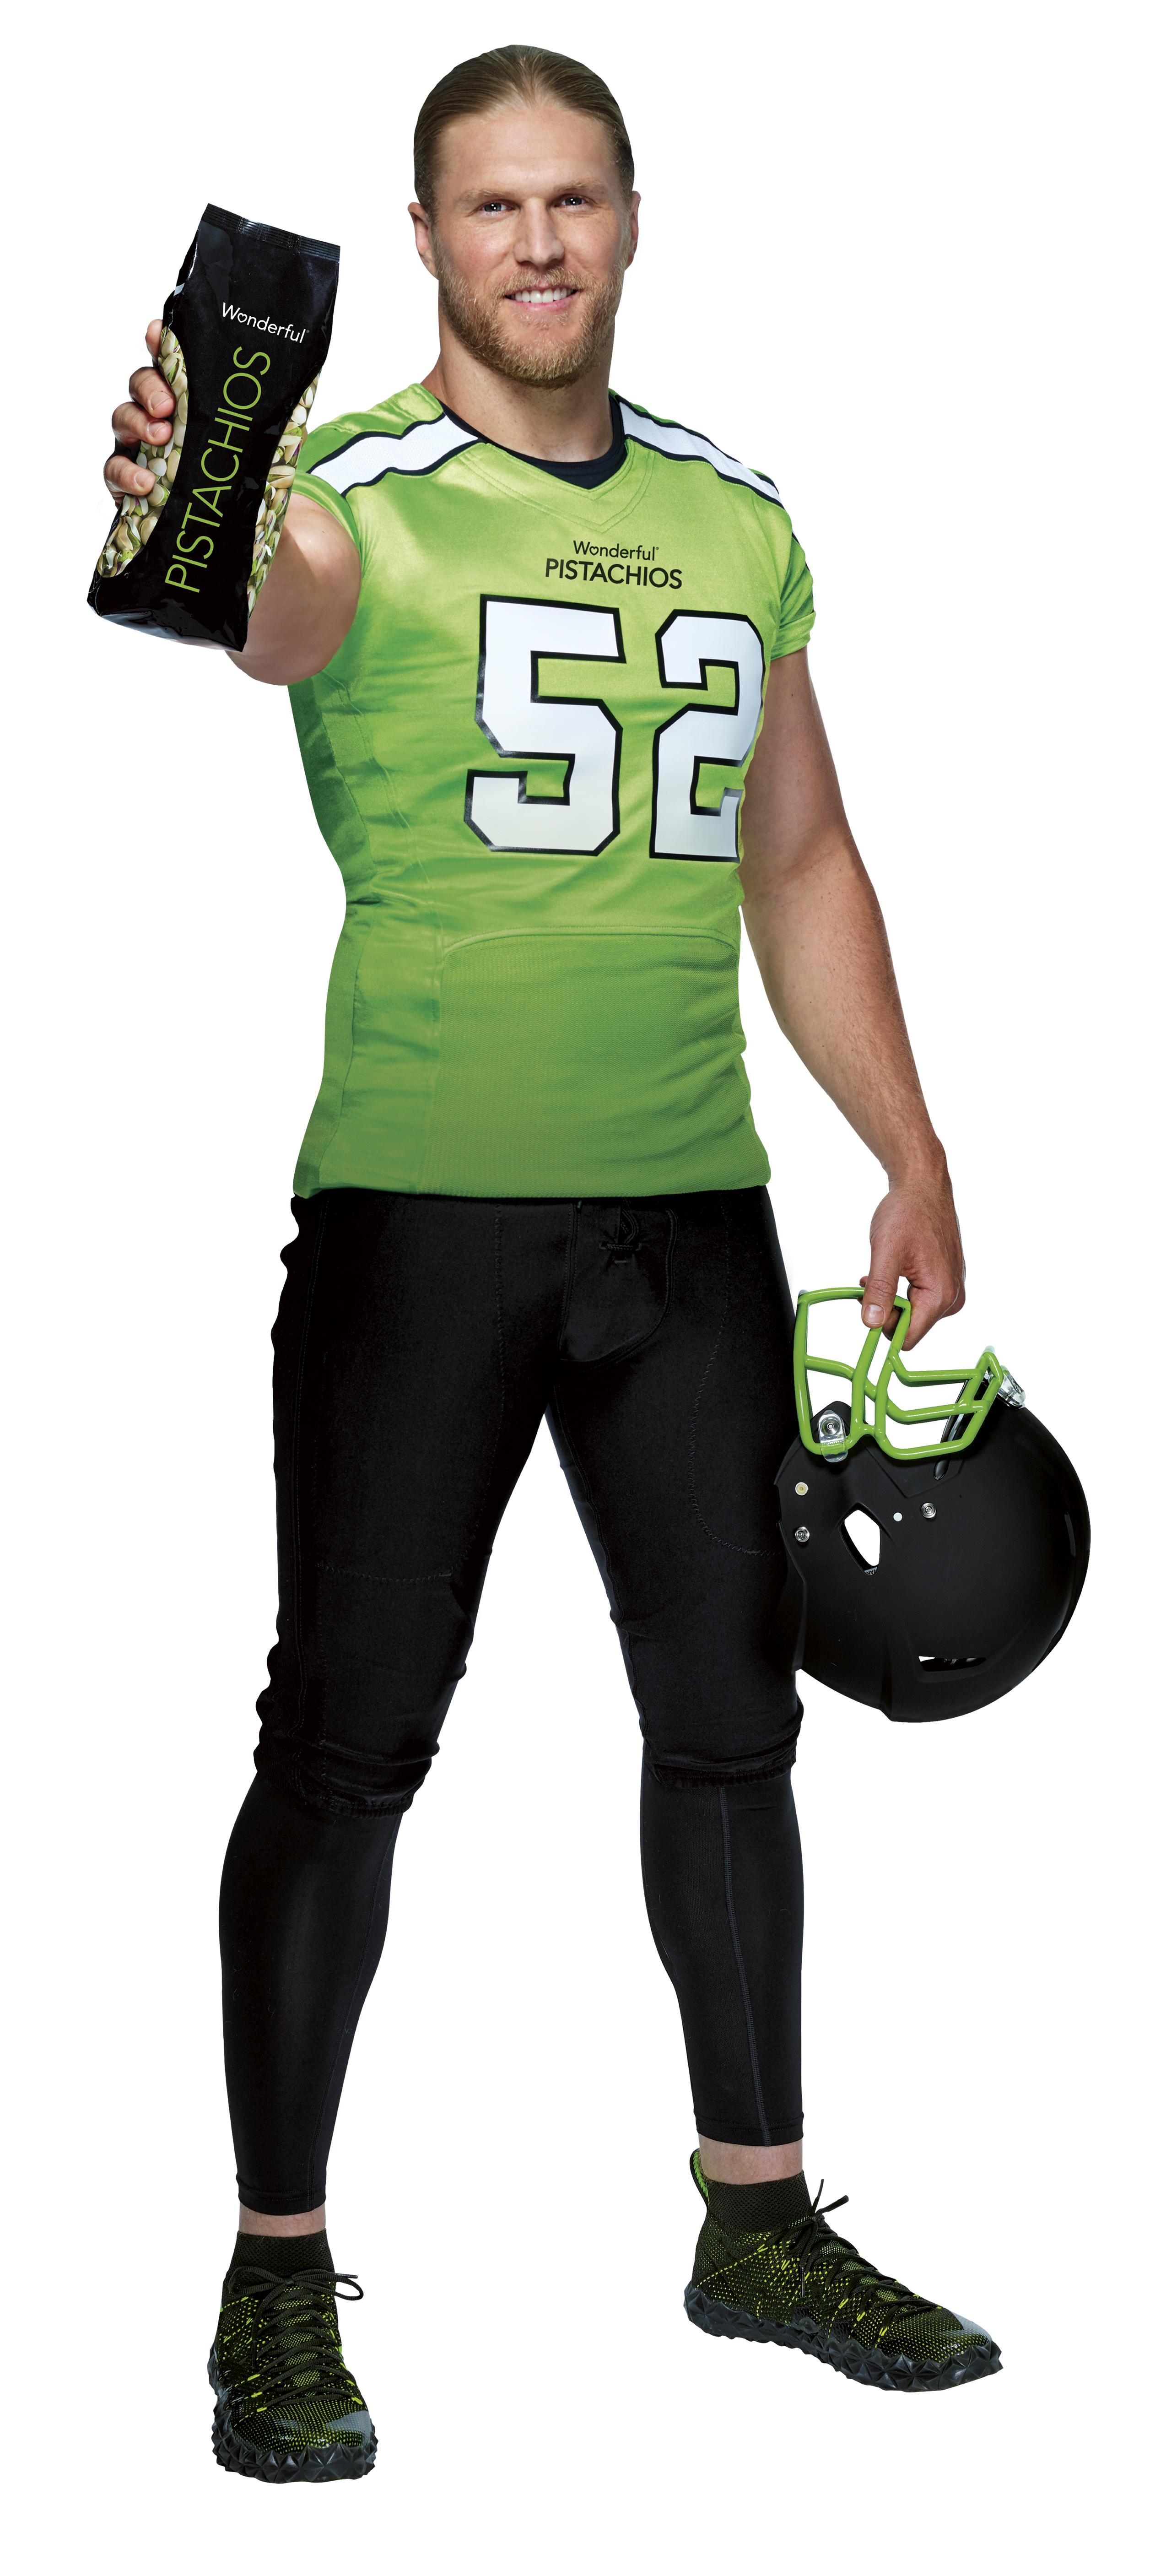 Seattle Seahawks Cornerback Richard Sherman and Green Bay Packers